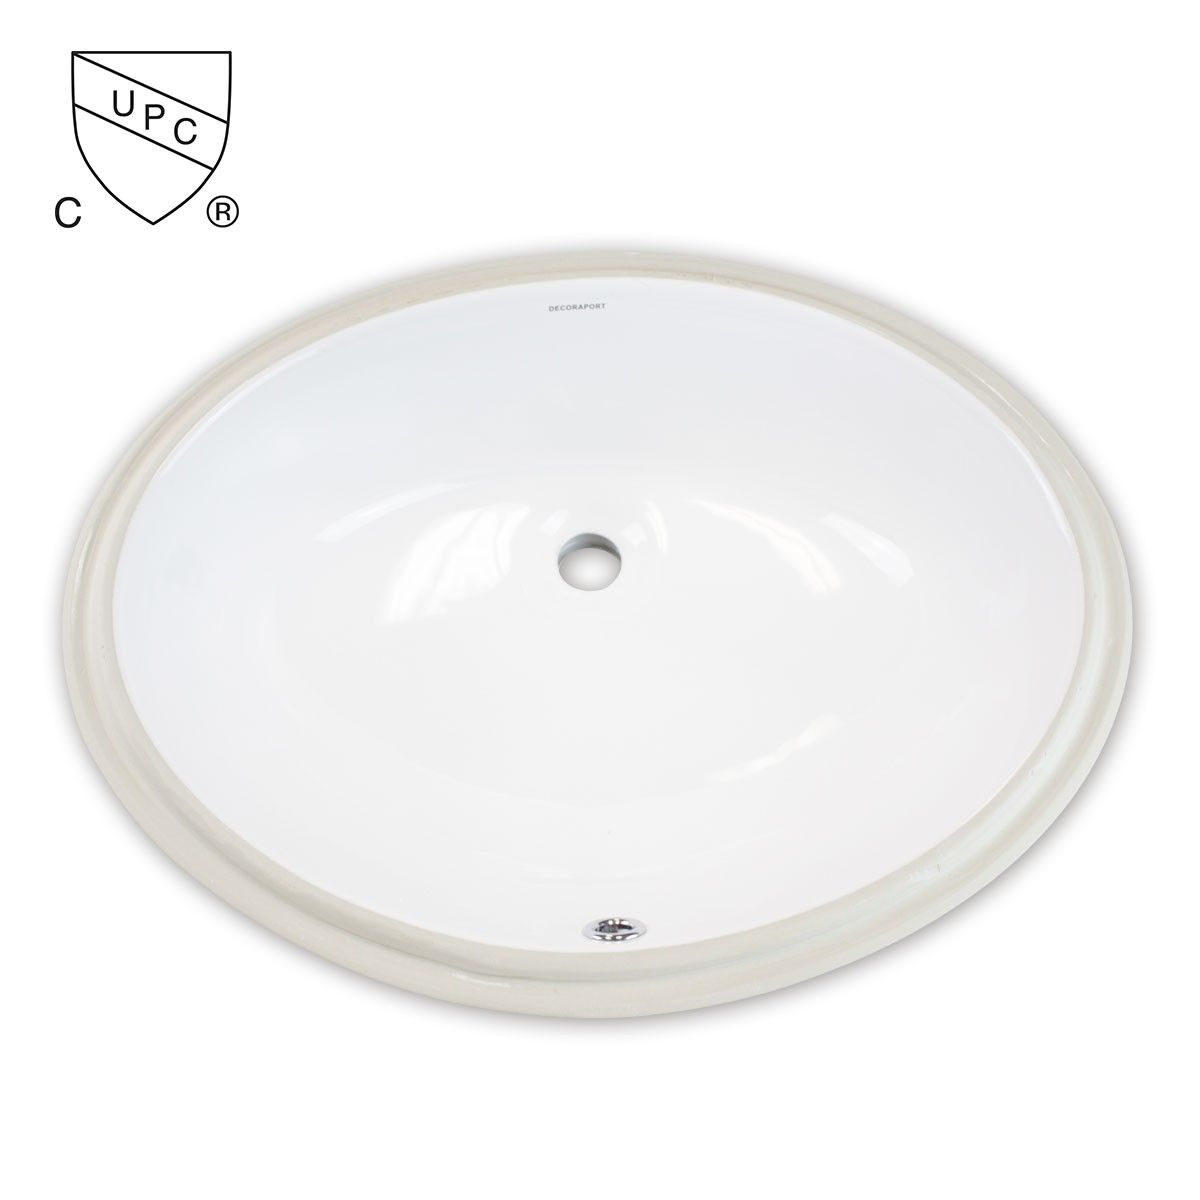 Decoraport White Oval Ceramic Under Mount Basin (MY-3708)